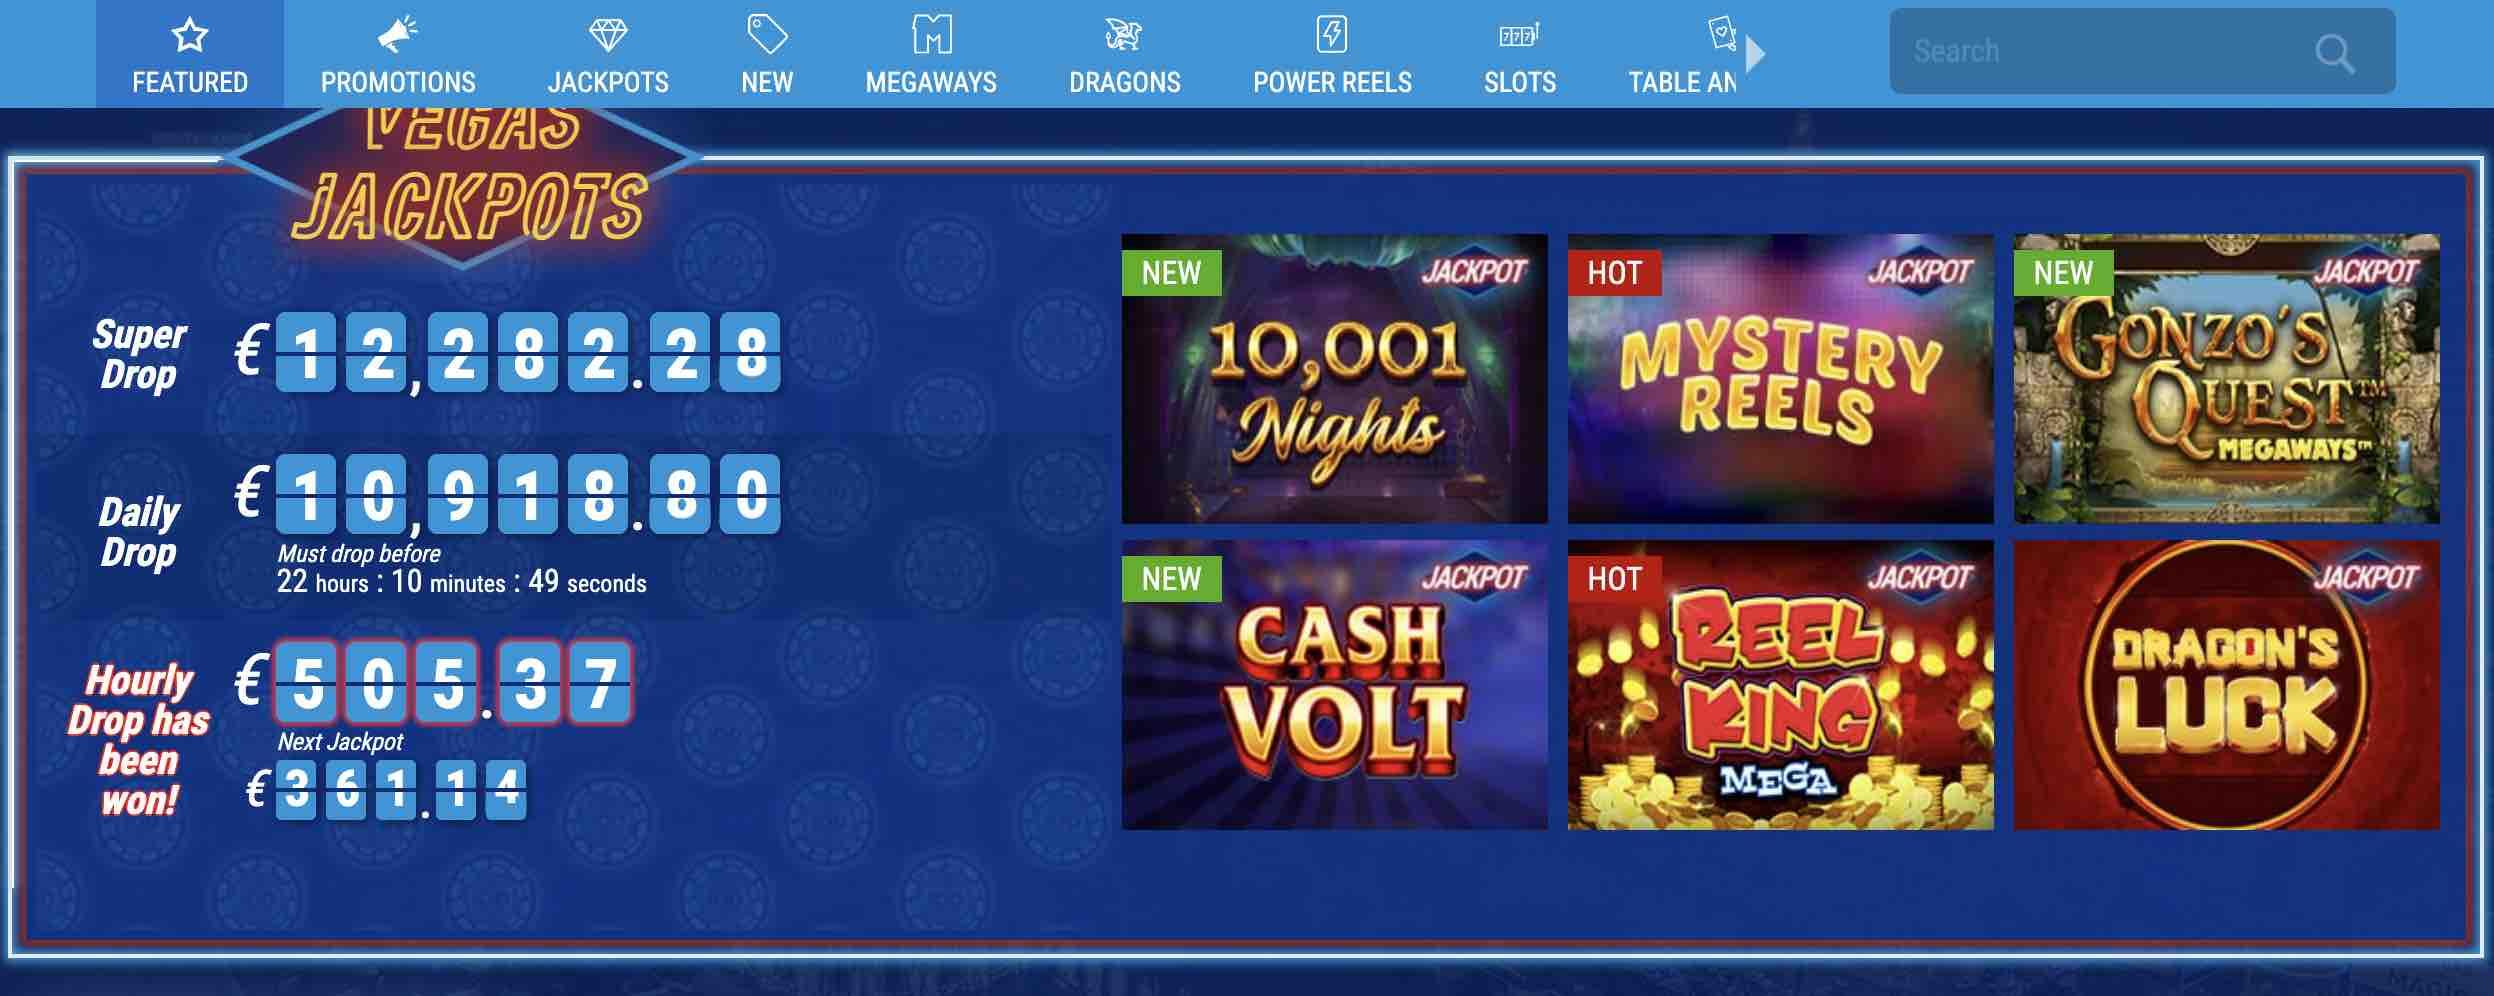 Best Slots at BoyleSports Casino